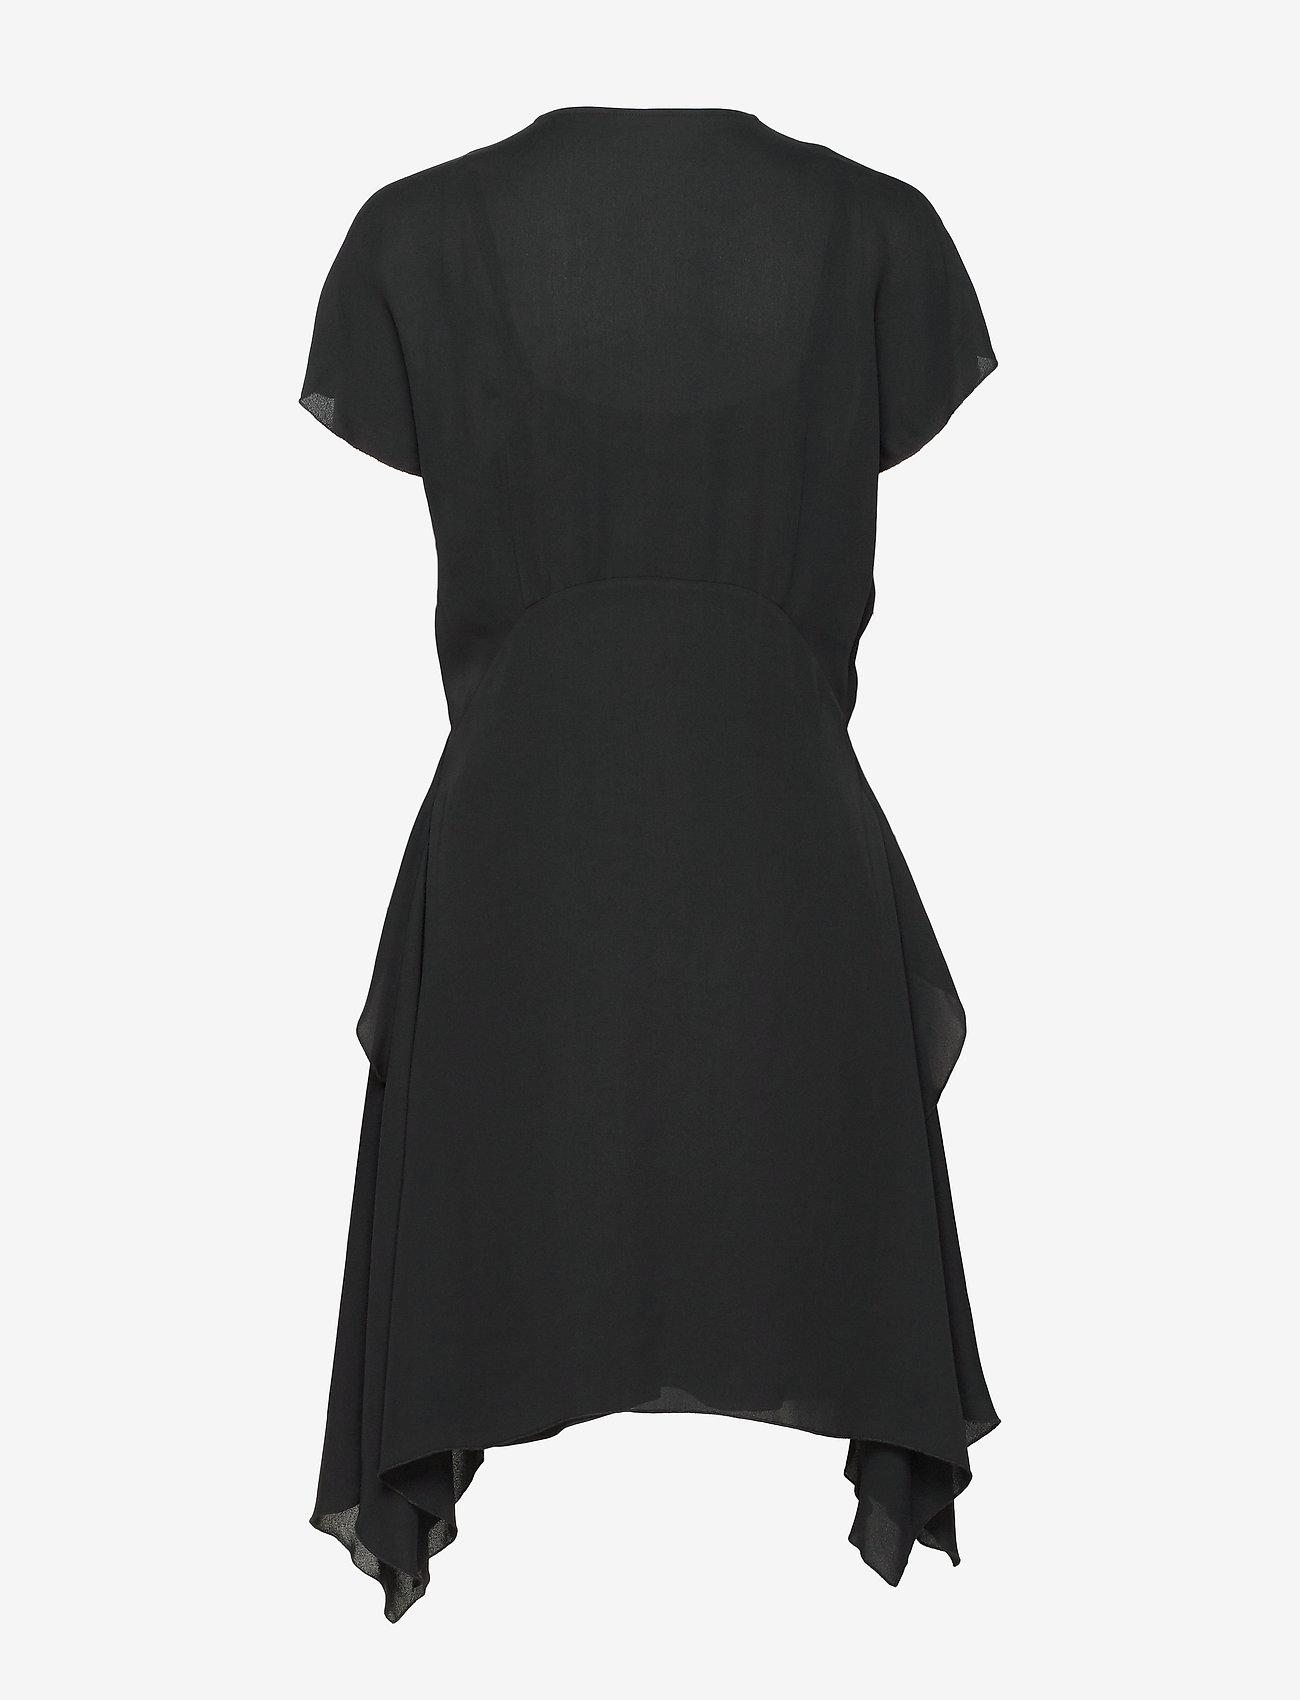 Balizia (Black) (1349.50 kr) - By Malene Birger